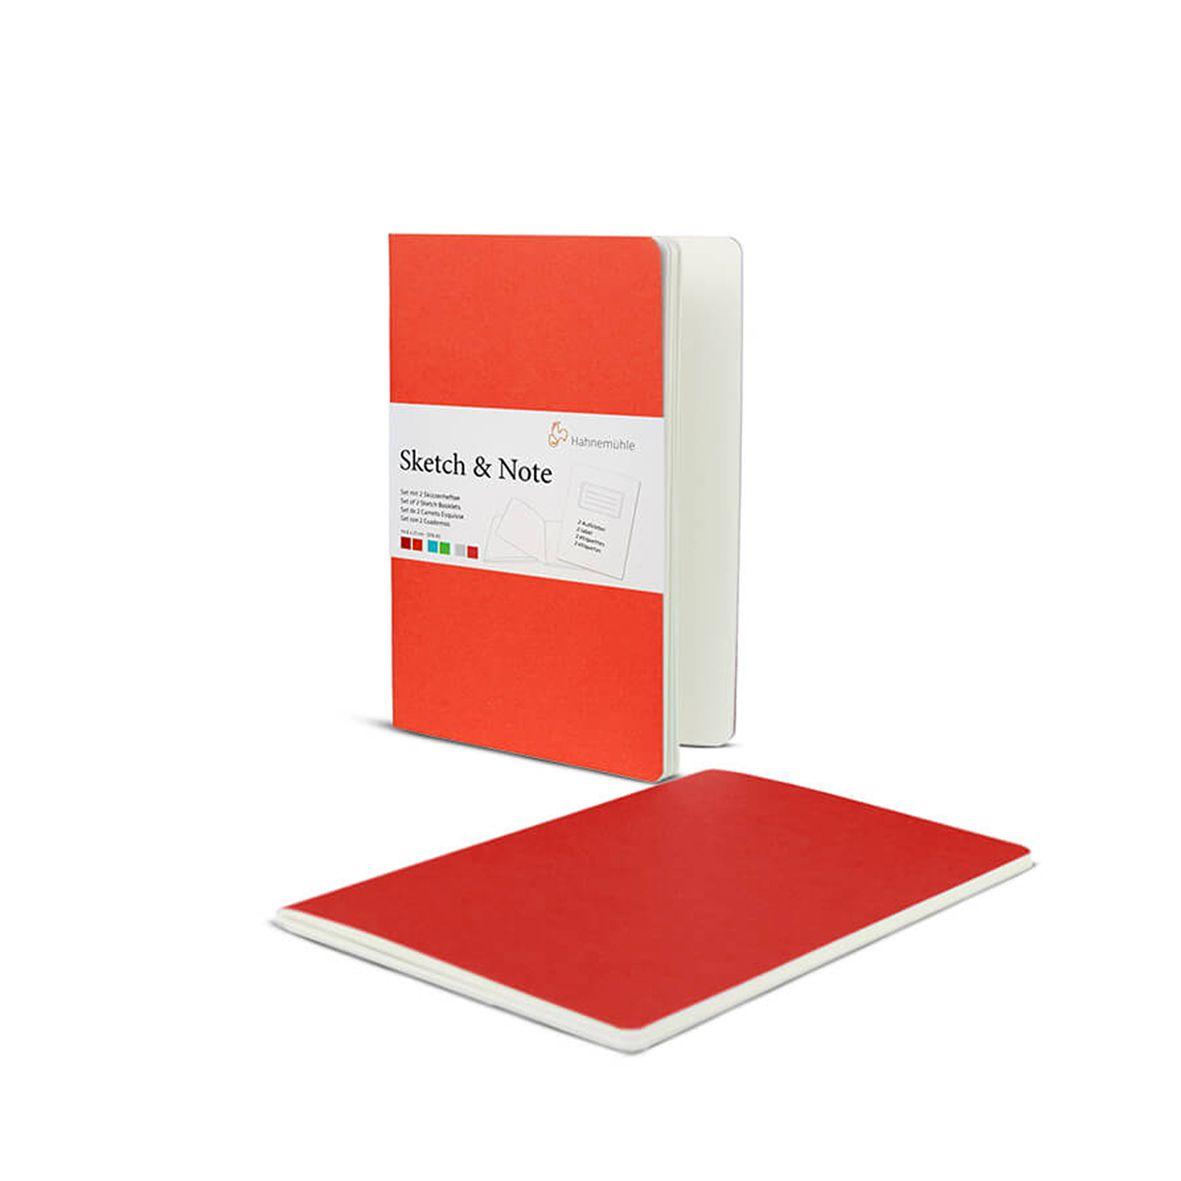 Sketch Note A5 125g m2 costurado 40 páginas 2x Vermelho e Laranja - Hahnemühle